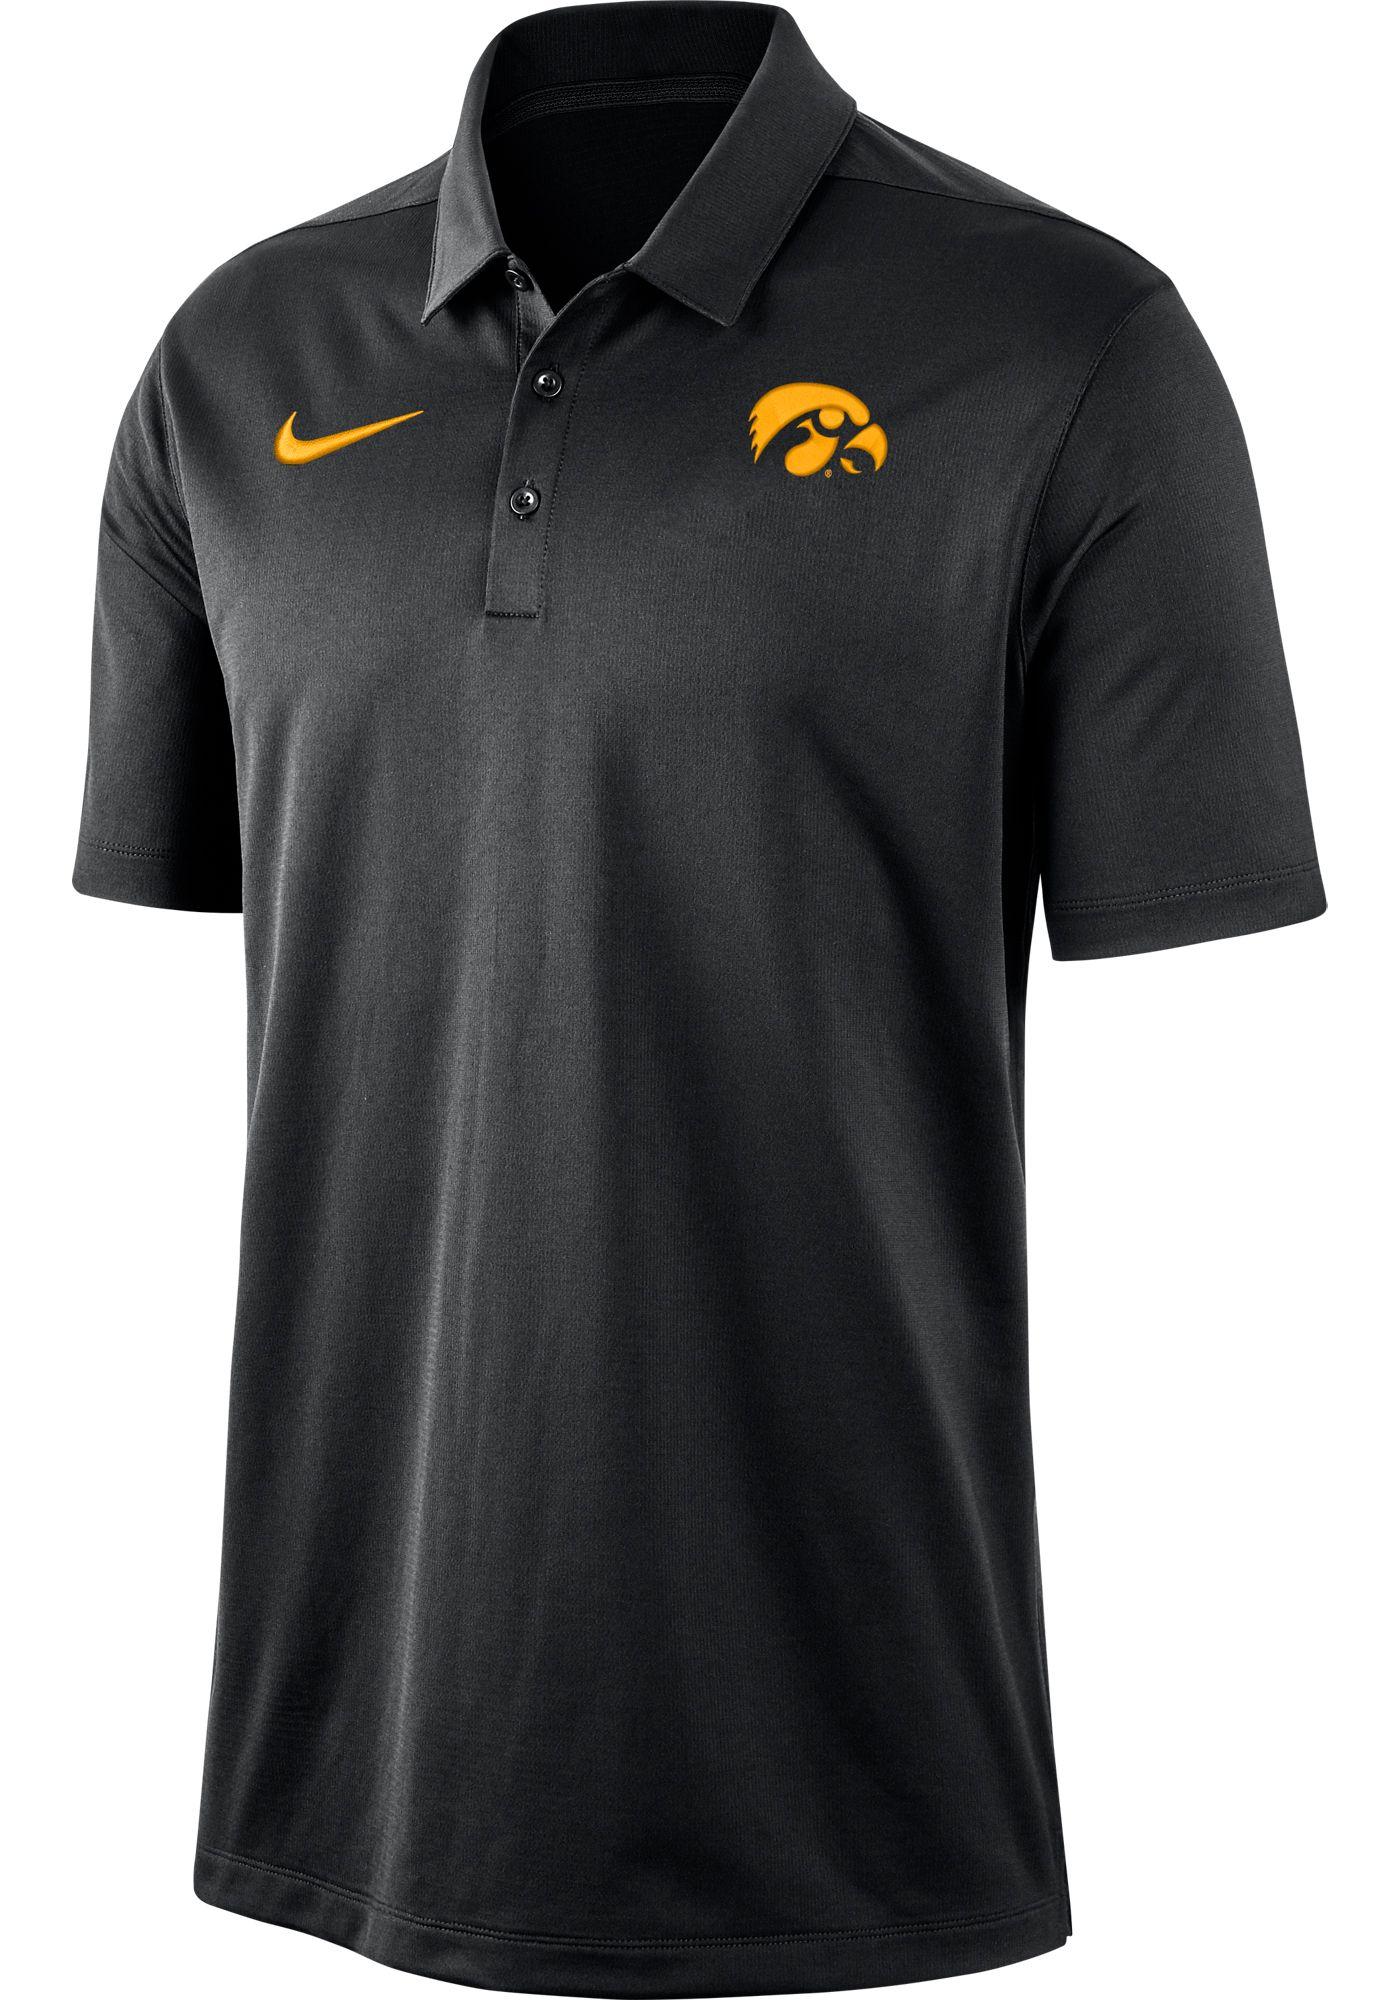 Nike Men's Iowa Hawkeyes Dri-FIT Franchise Black Polo